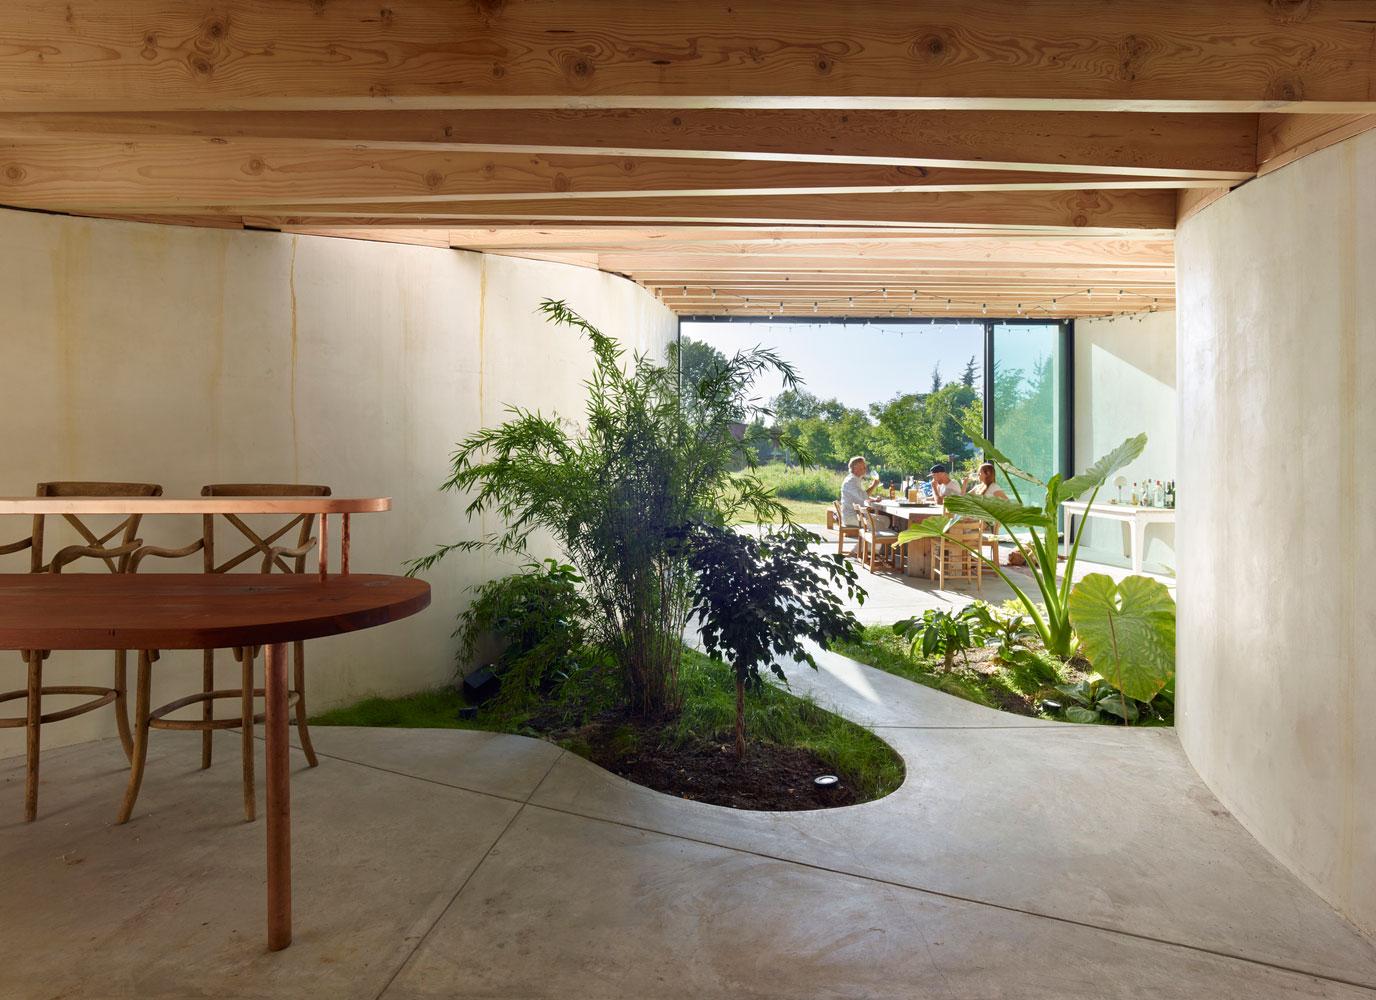 Artist studio with indoor garden by mork ulnes architects for Indoor gardening pdf